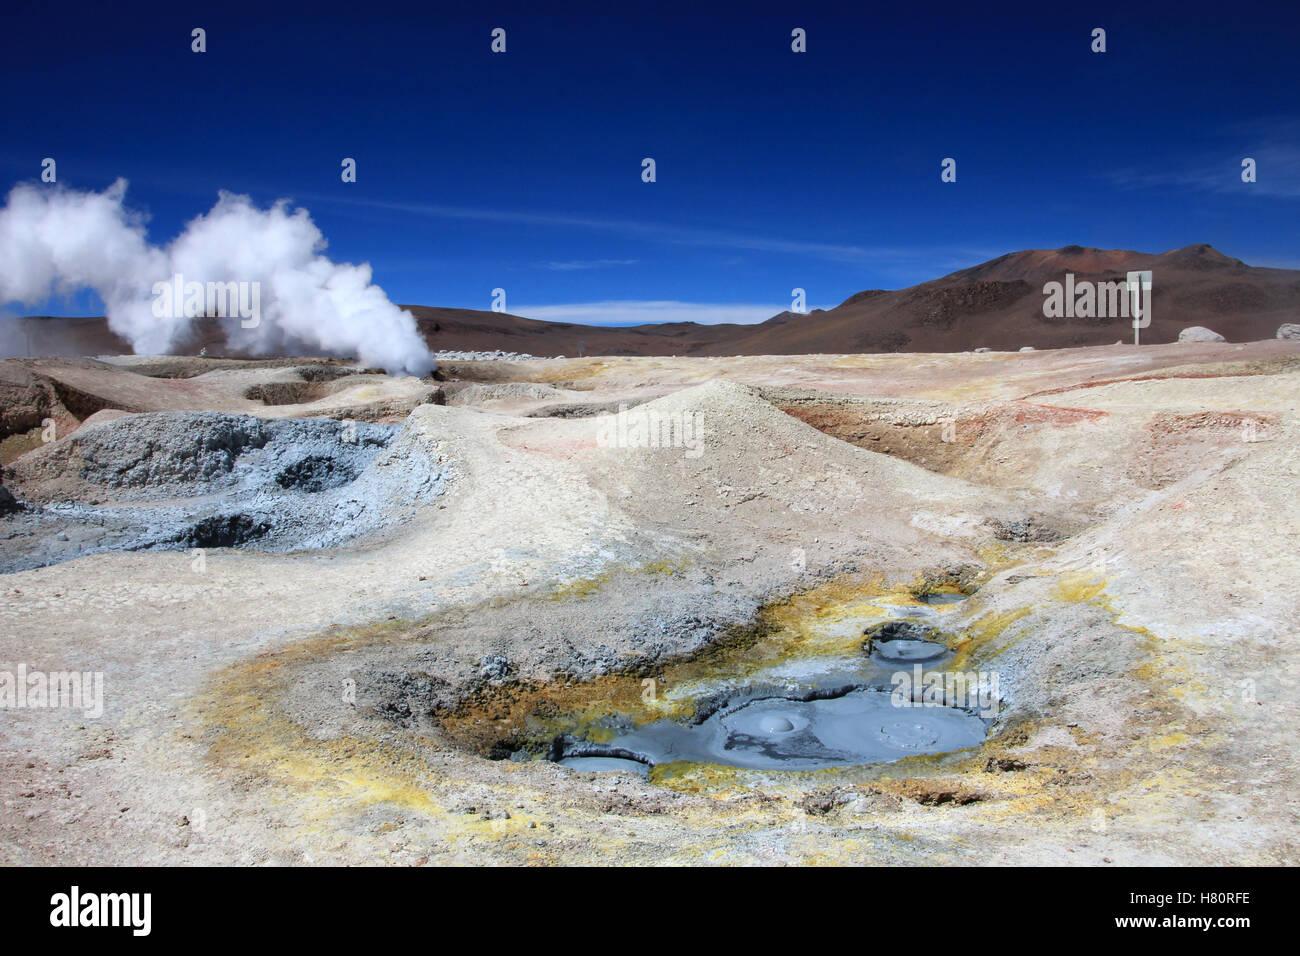 Sol de manana geyser field, Bolivia - Stock Image